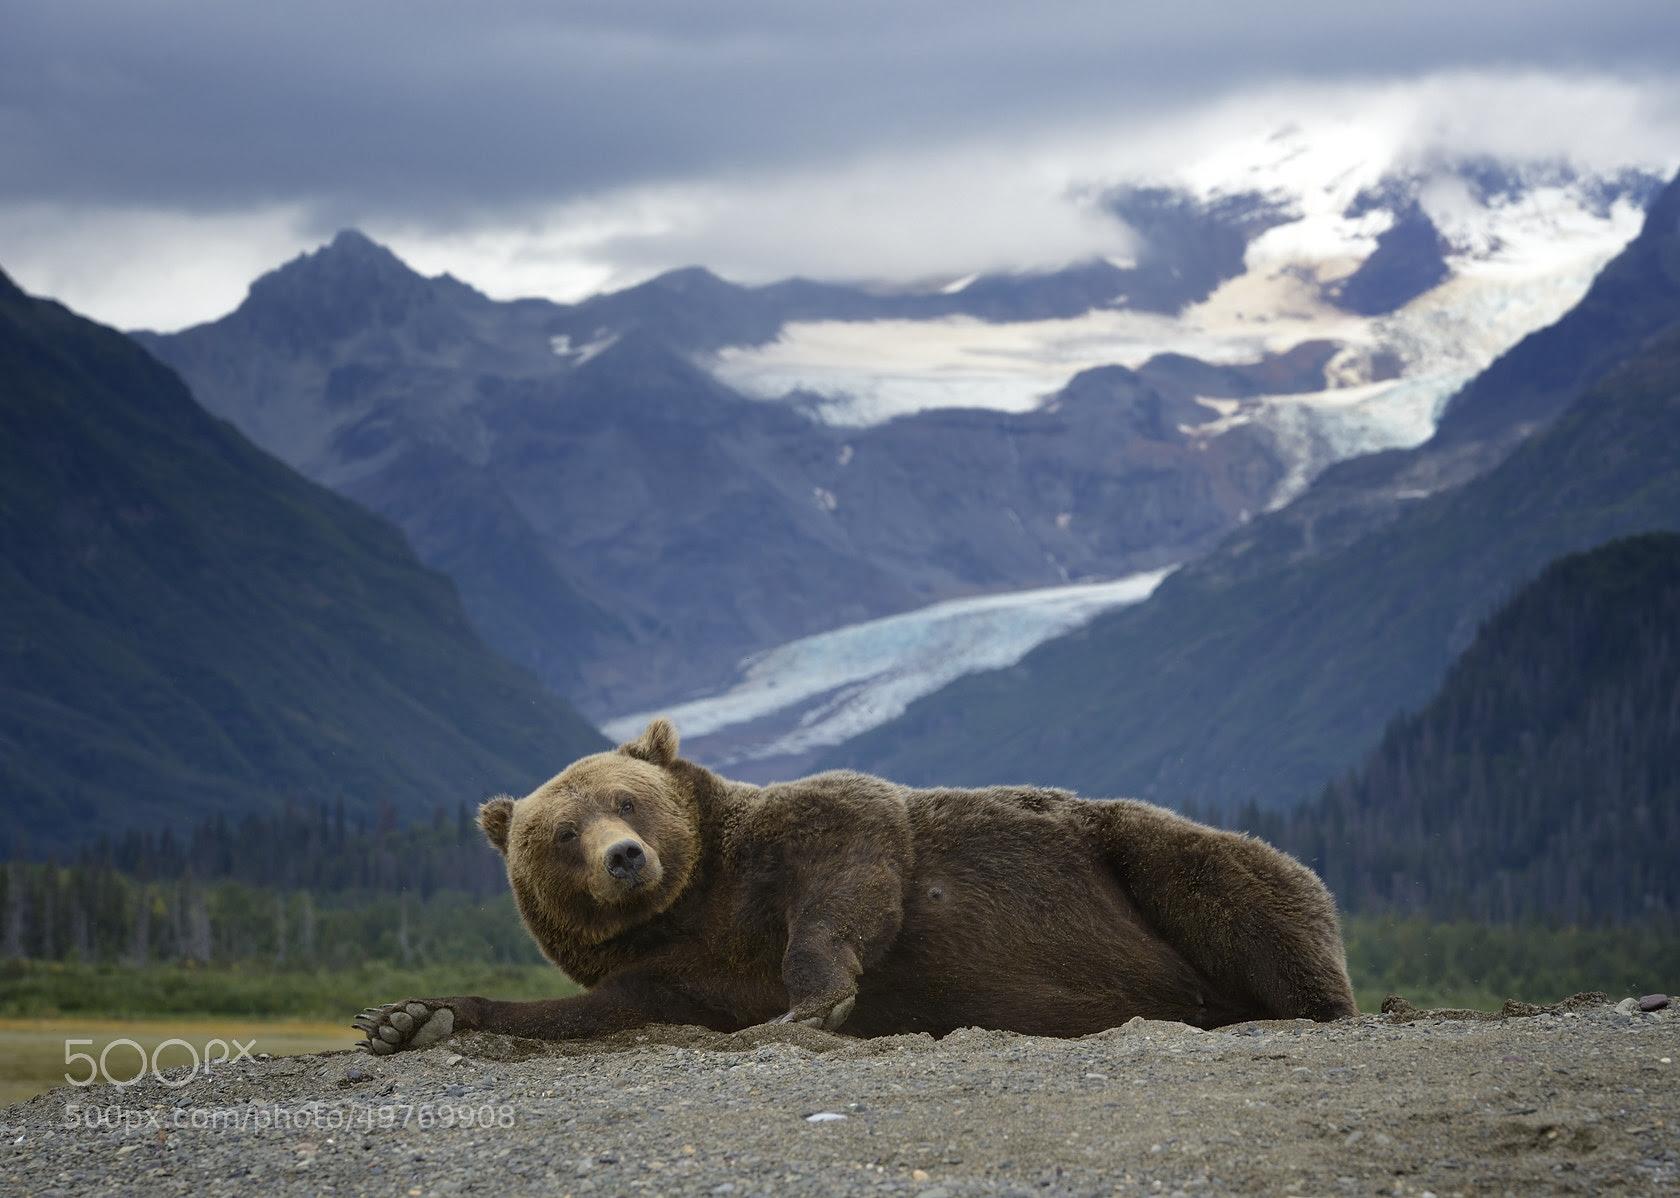 miss alaska grizzly bear brown mother olav thokle mountains